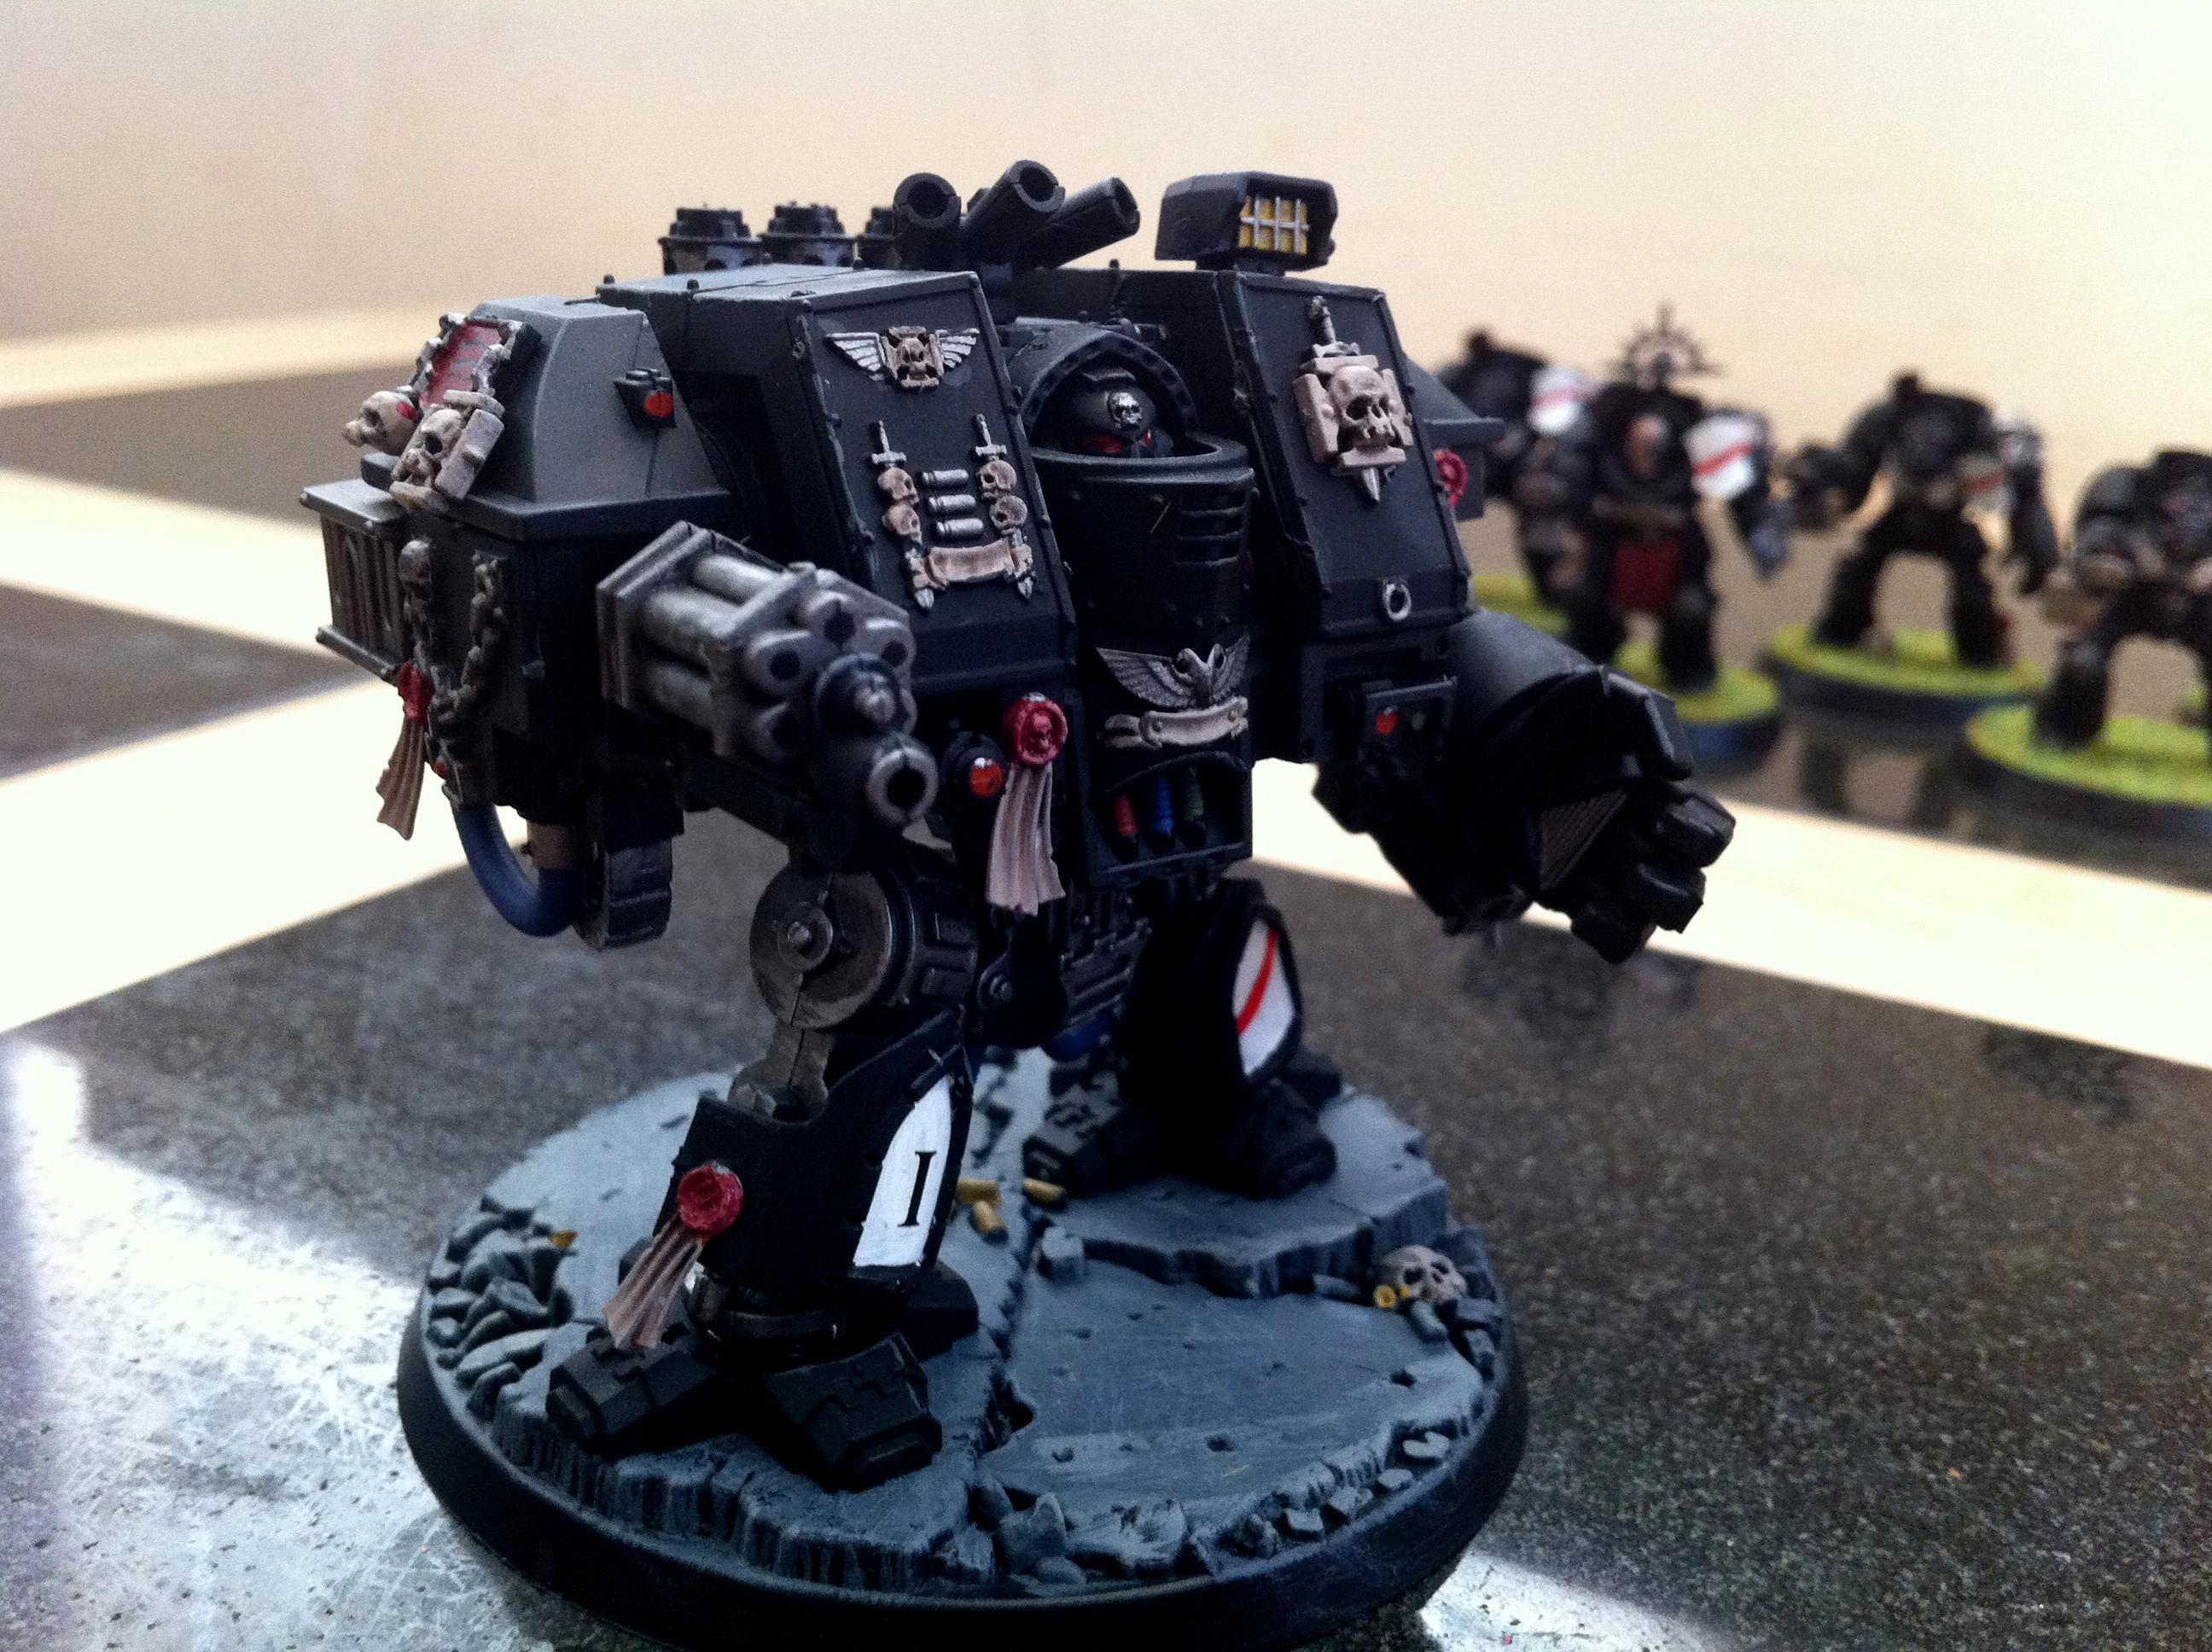 Adeptus Astartes, Black Templars, Space Marines, Venerable Dreadnought, Warhammer 40,000